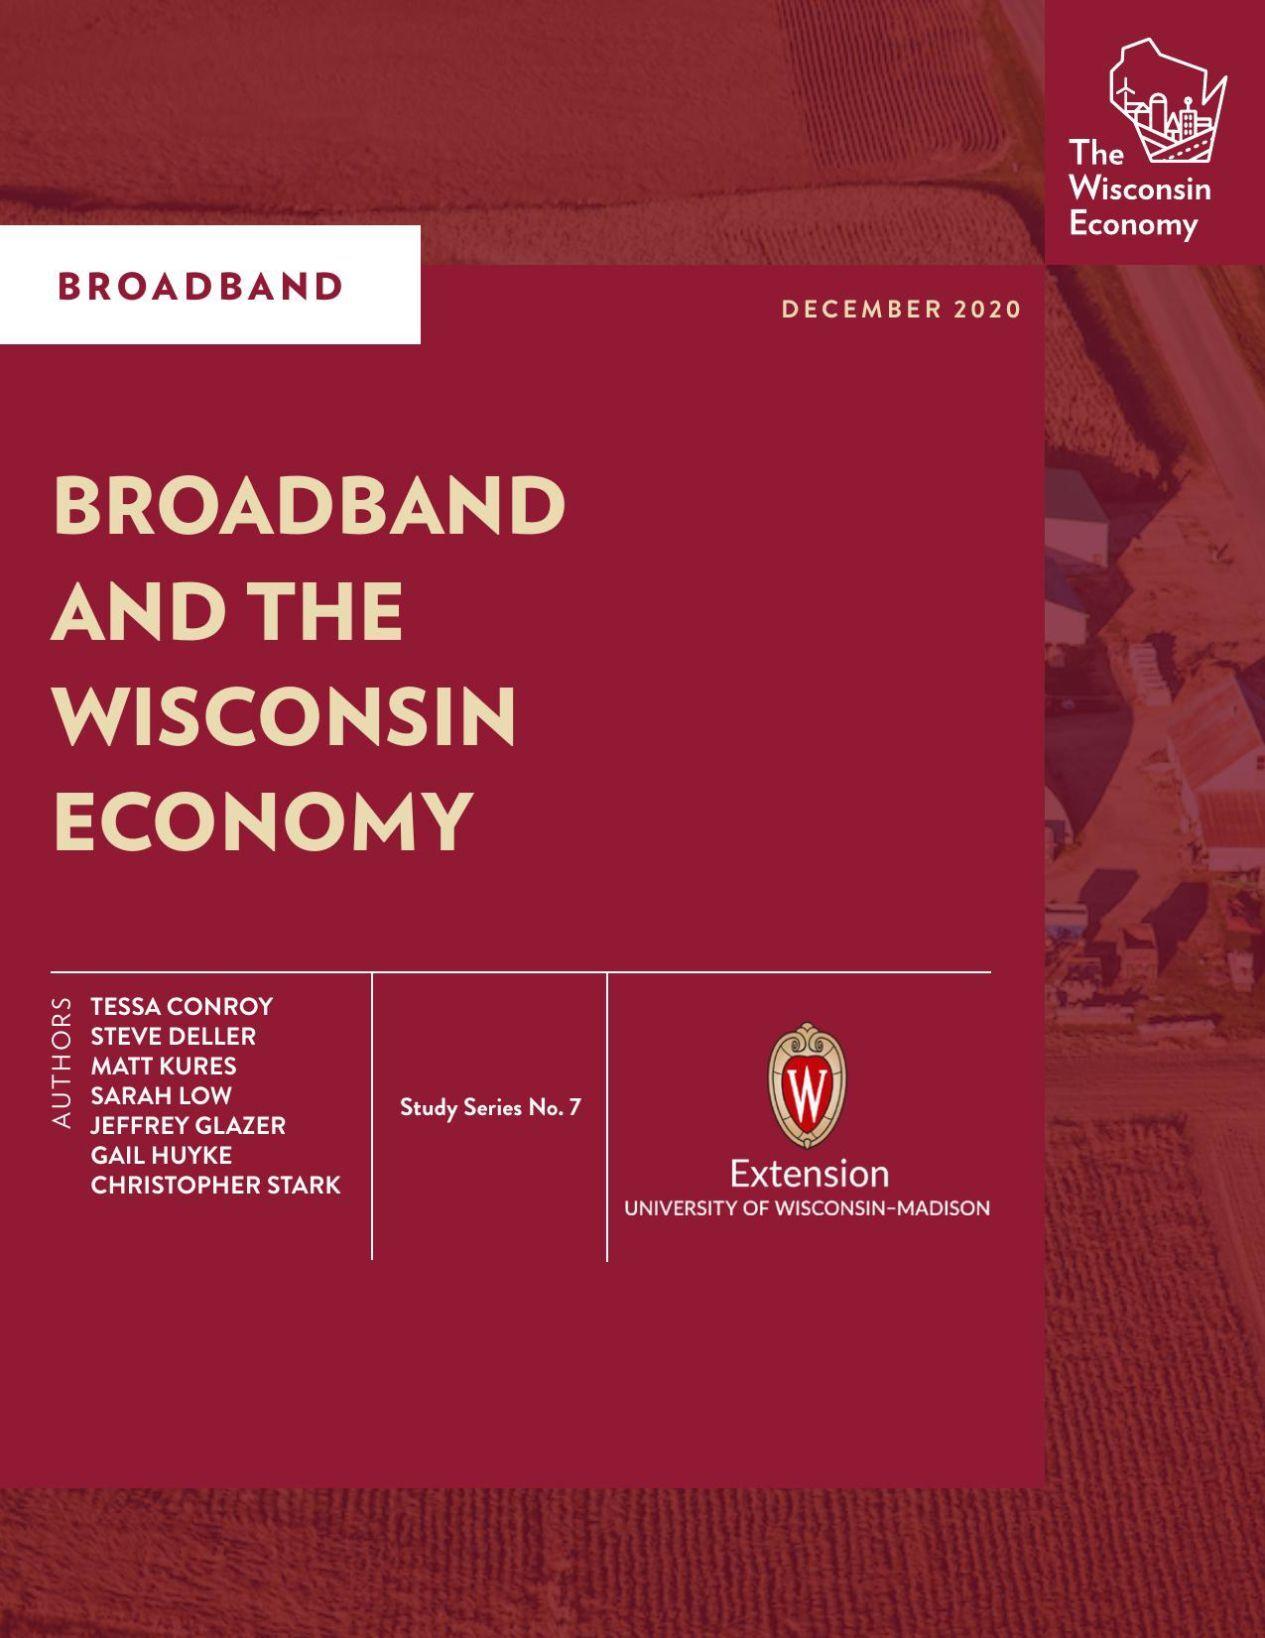 Broadband and the Wisconsin Economy